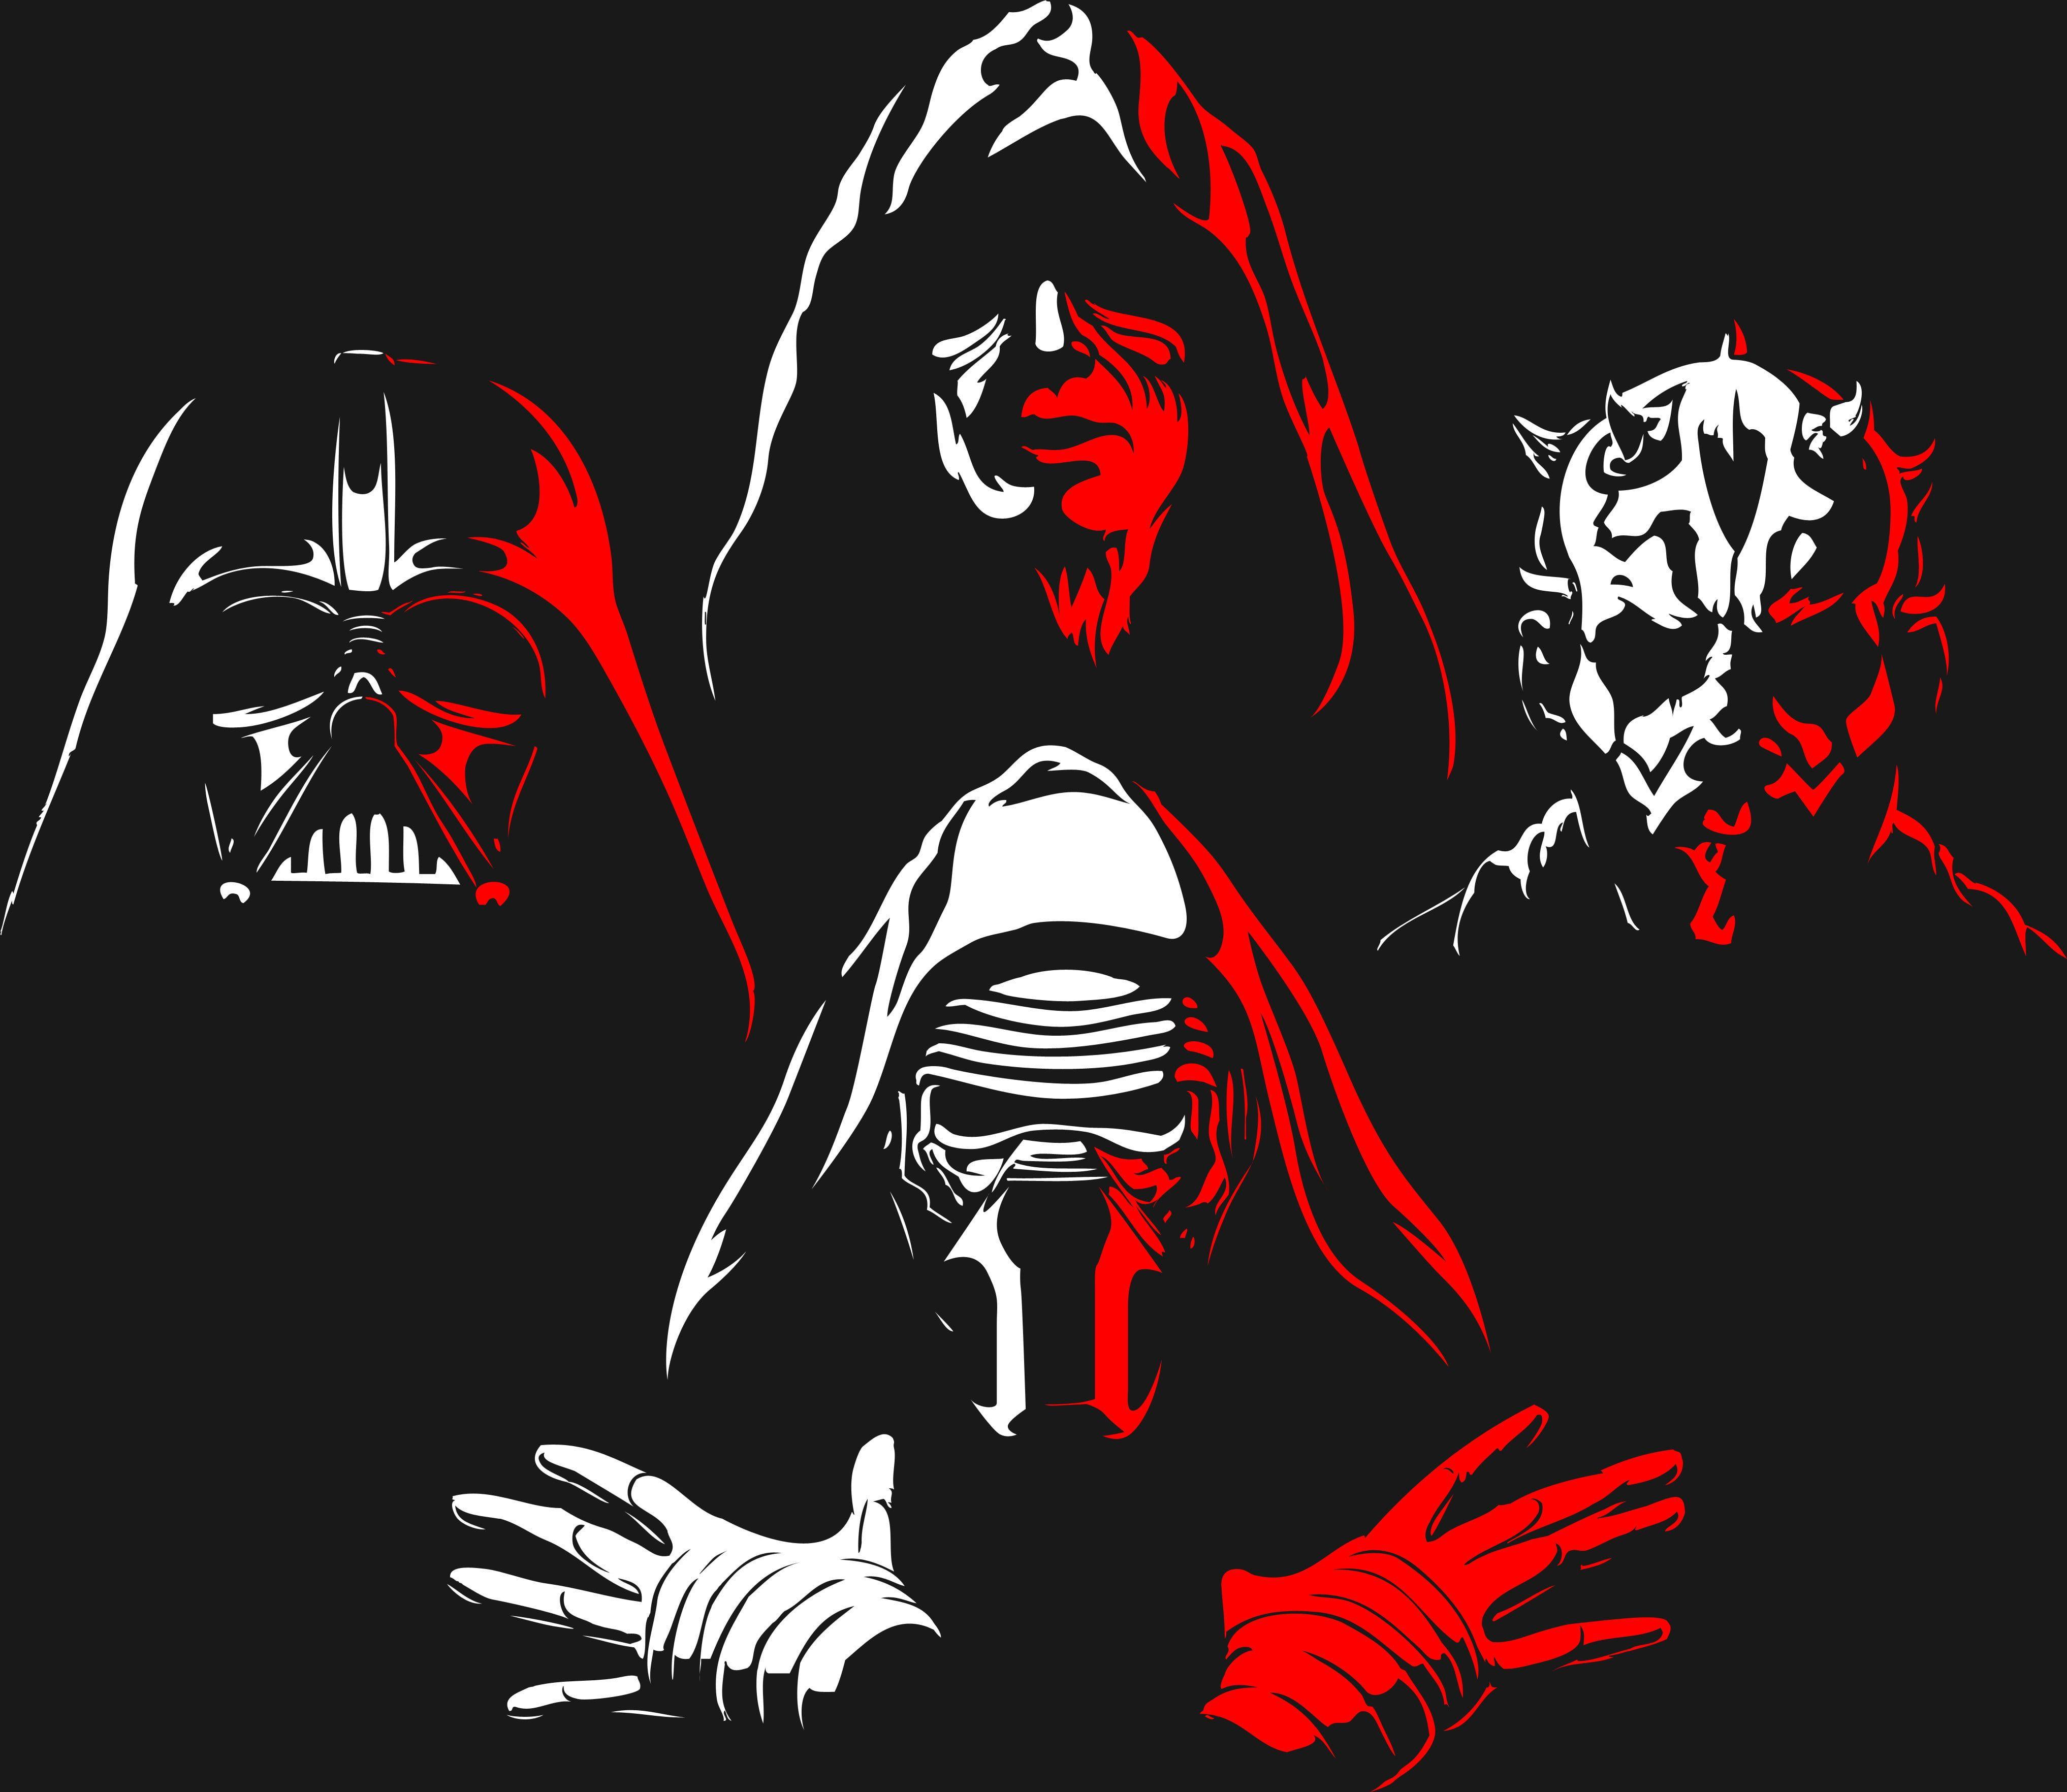 Star Wars Characters Illustration Red White Star Wars Darth Maul Darth Vader Kylo Ren 4k Wallpap Star Wars Wallpaper Darth Vader Wallpaper Star Wars Poster